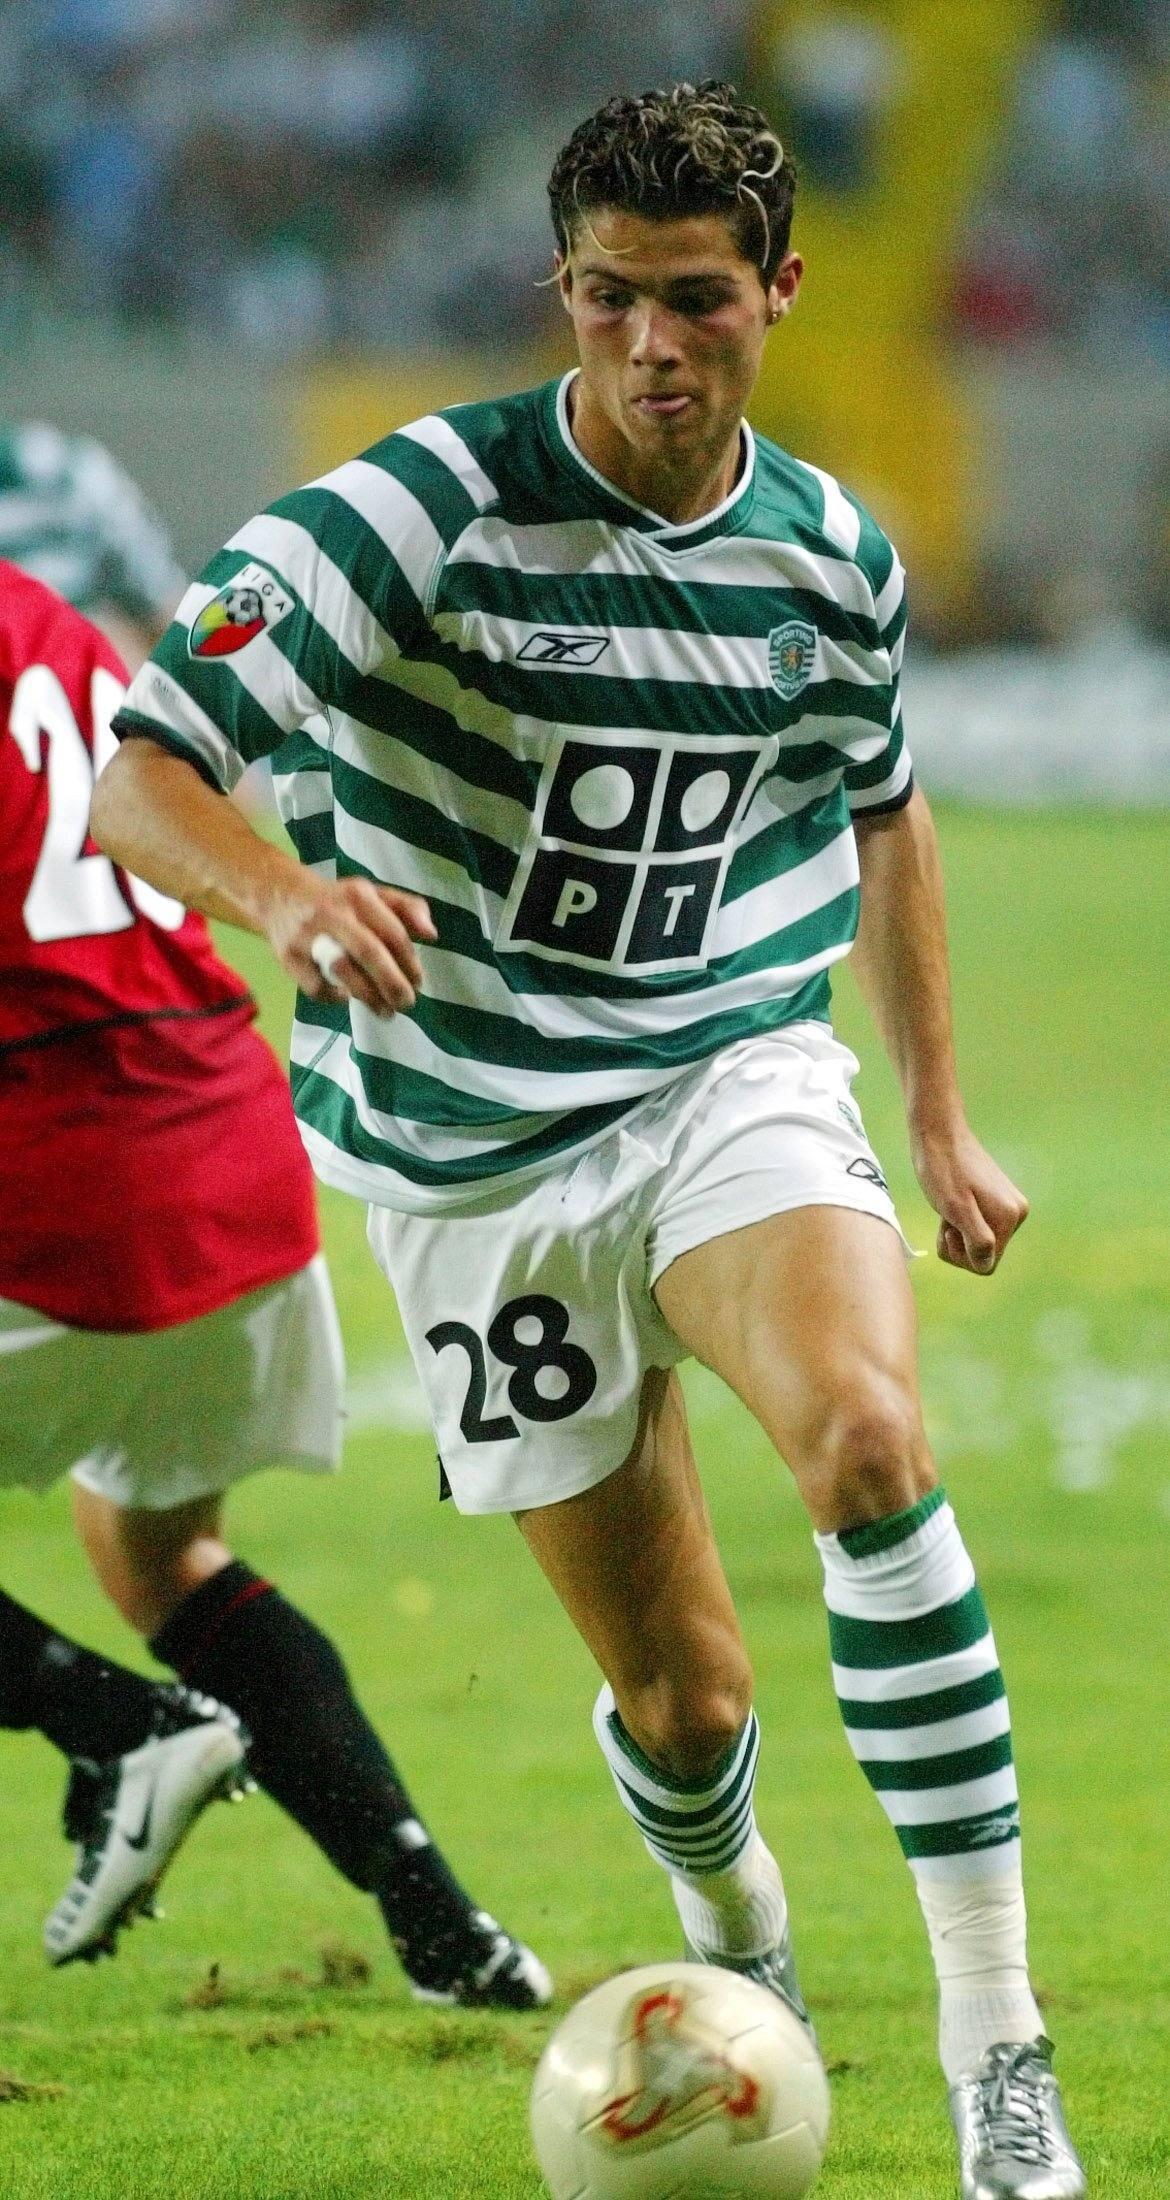 Cristiano Ronaldo, del infierno adolescente al Olimpo del fútbol